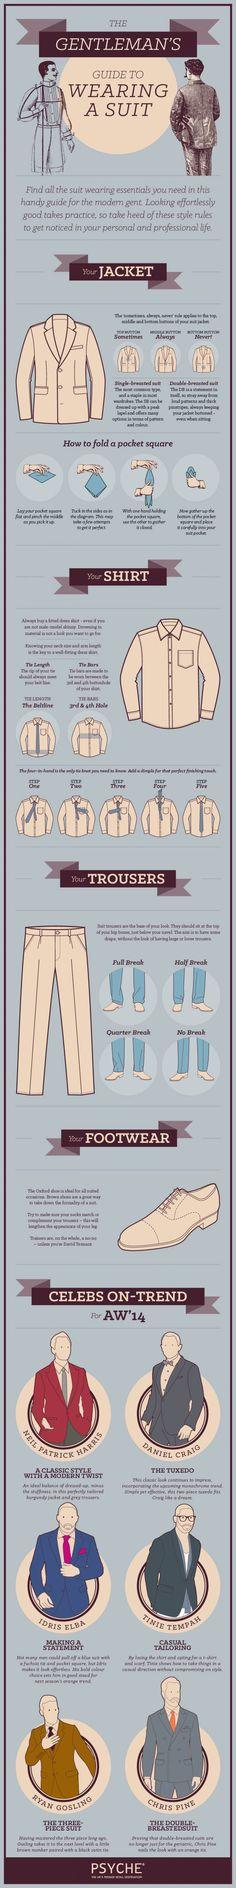 Gentleman's Guide to wearing a suit - Lifehacks